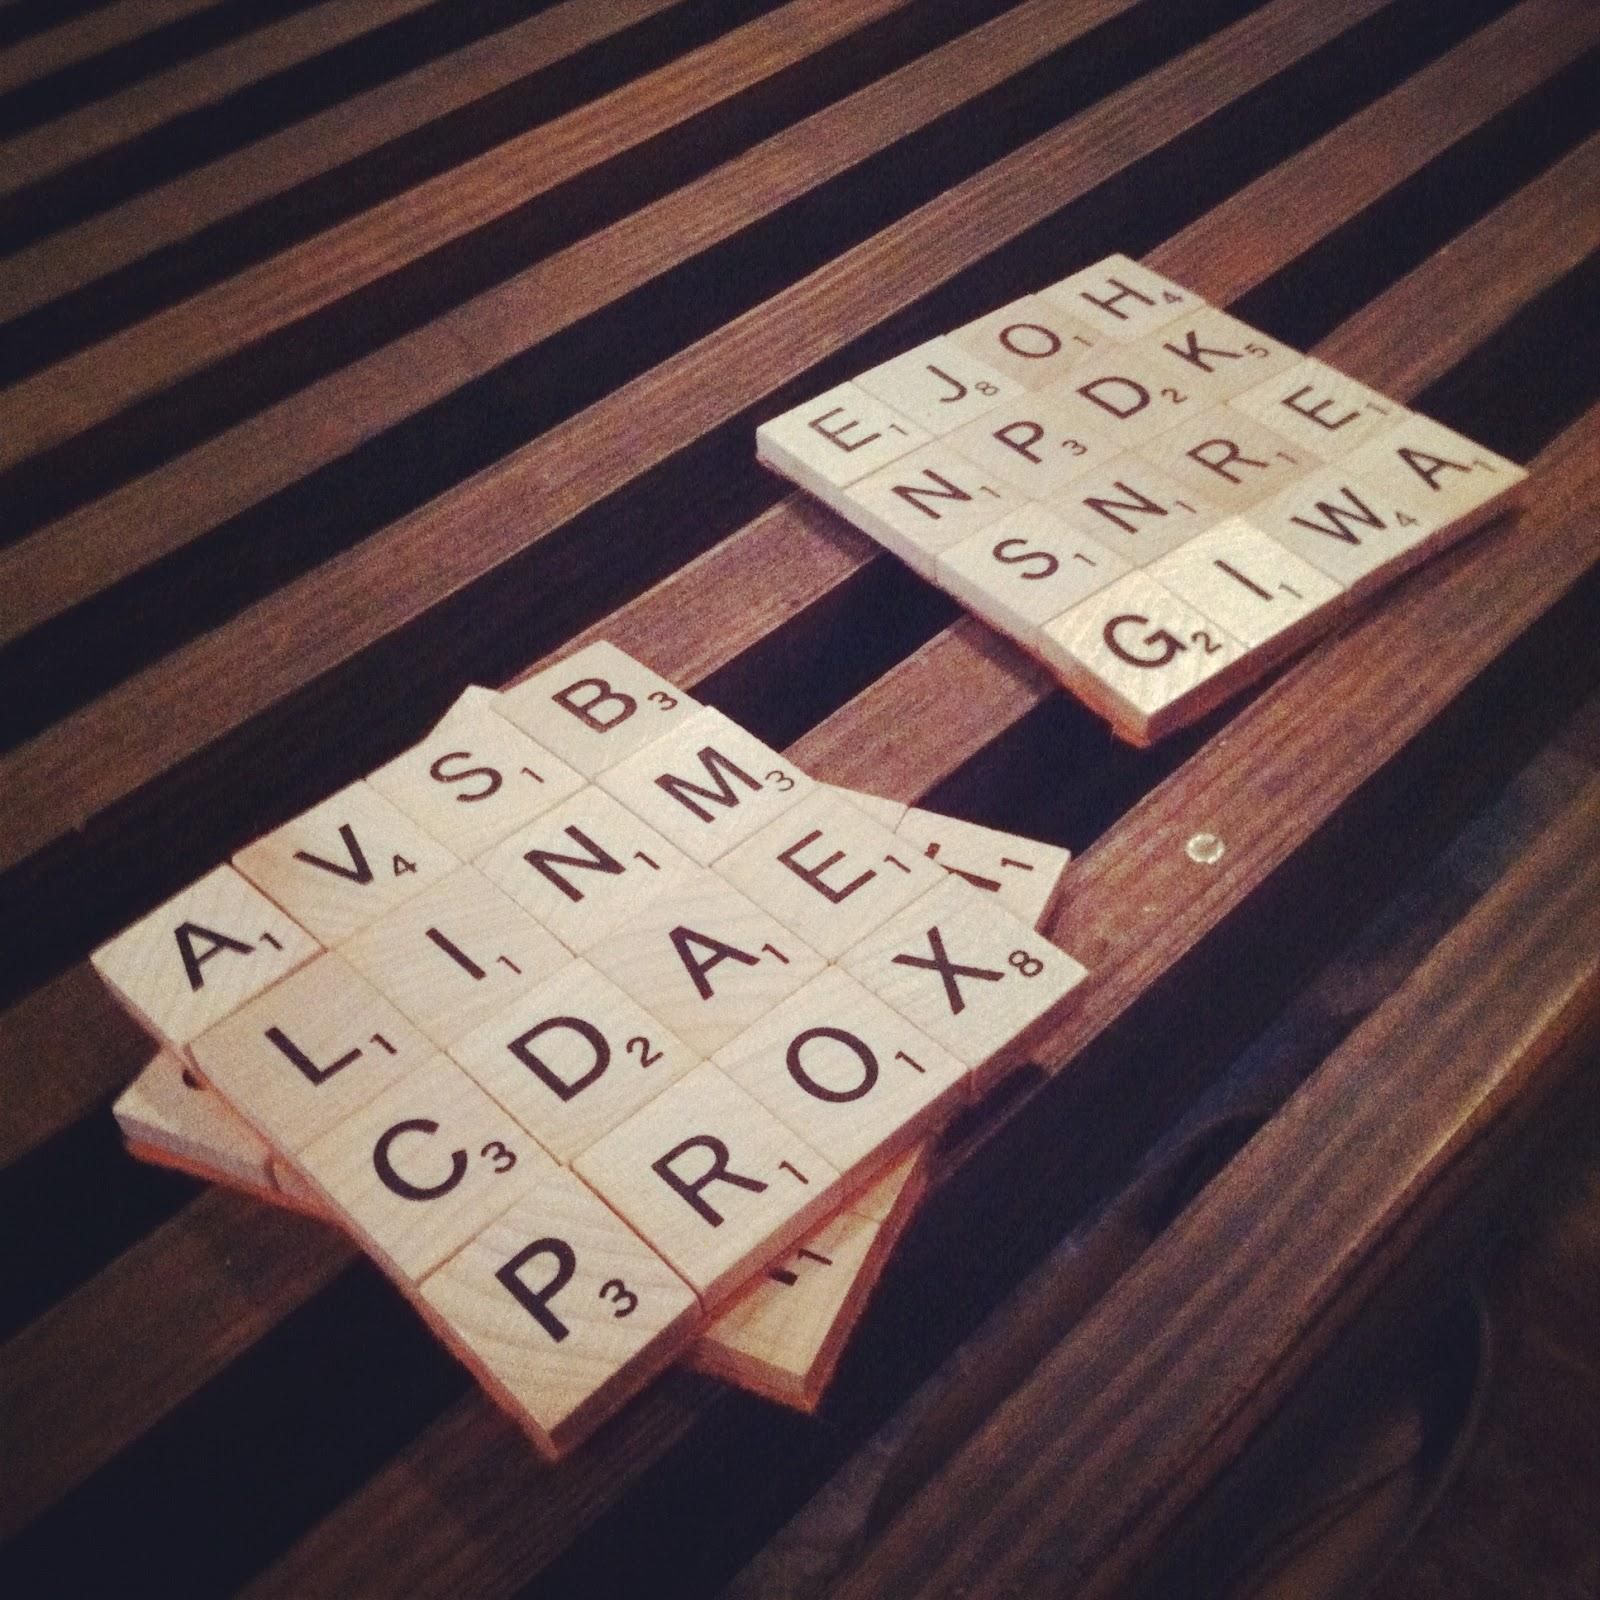 Fabulous Define Chaos Diy Scrabble Coasters Uwap Interior Chair Design Uwaporg